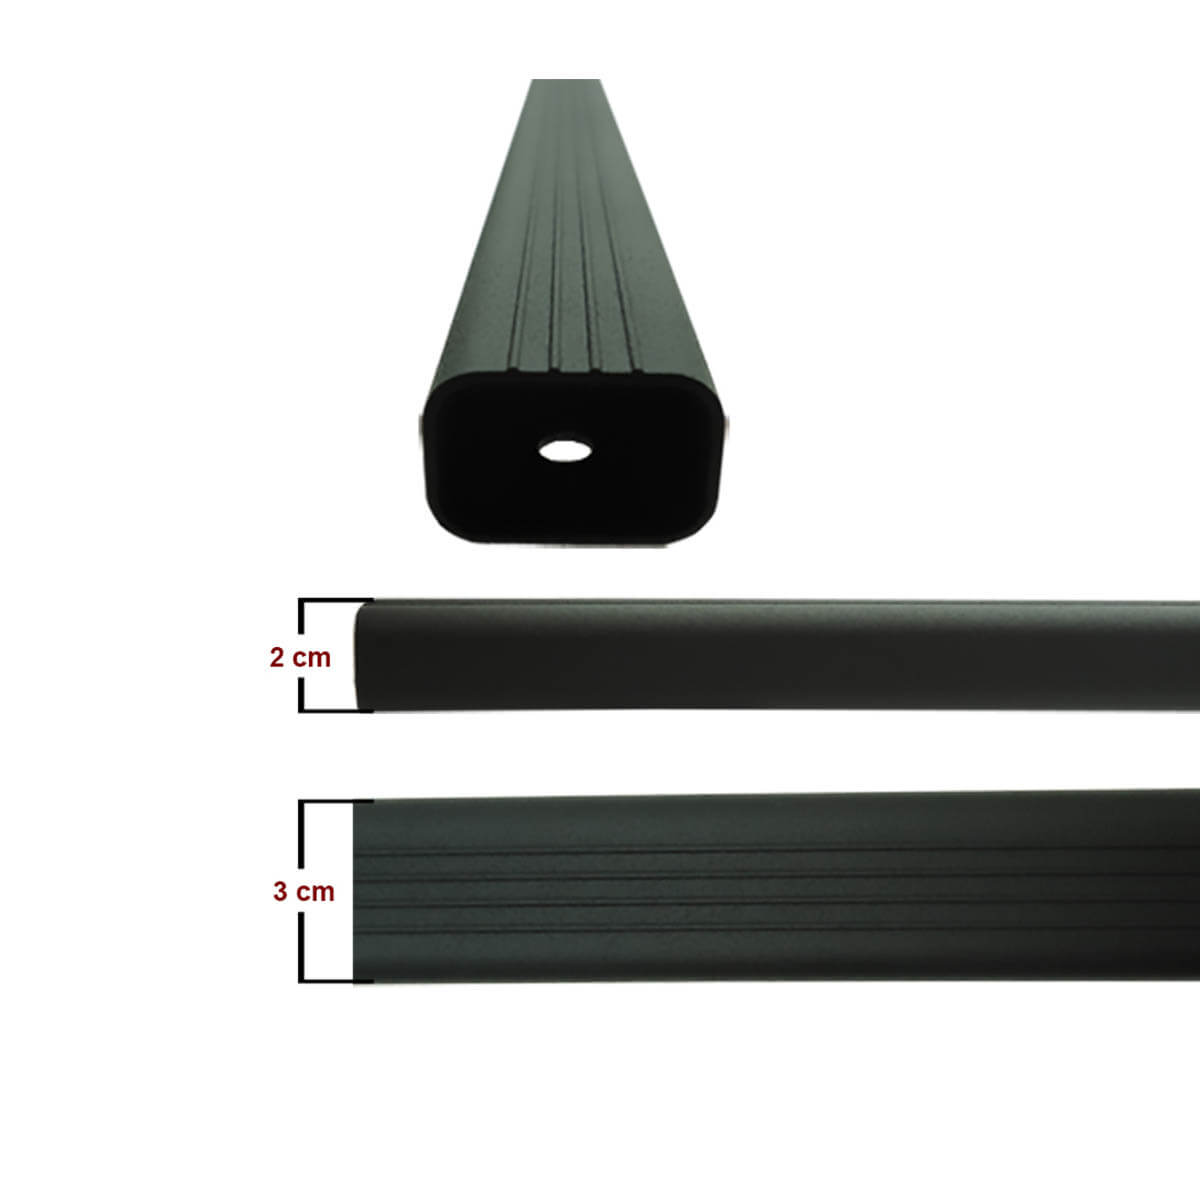 Travessa rack de teto alumínio preta Spacefox 2006 a 2018 ou Space Cross 2012 a 2018 kit 4 peças